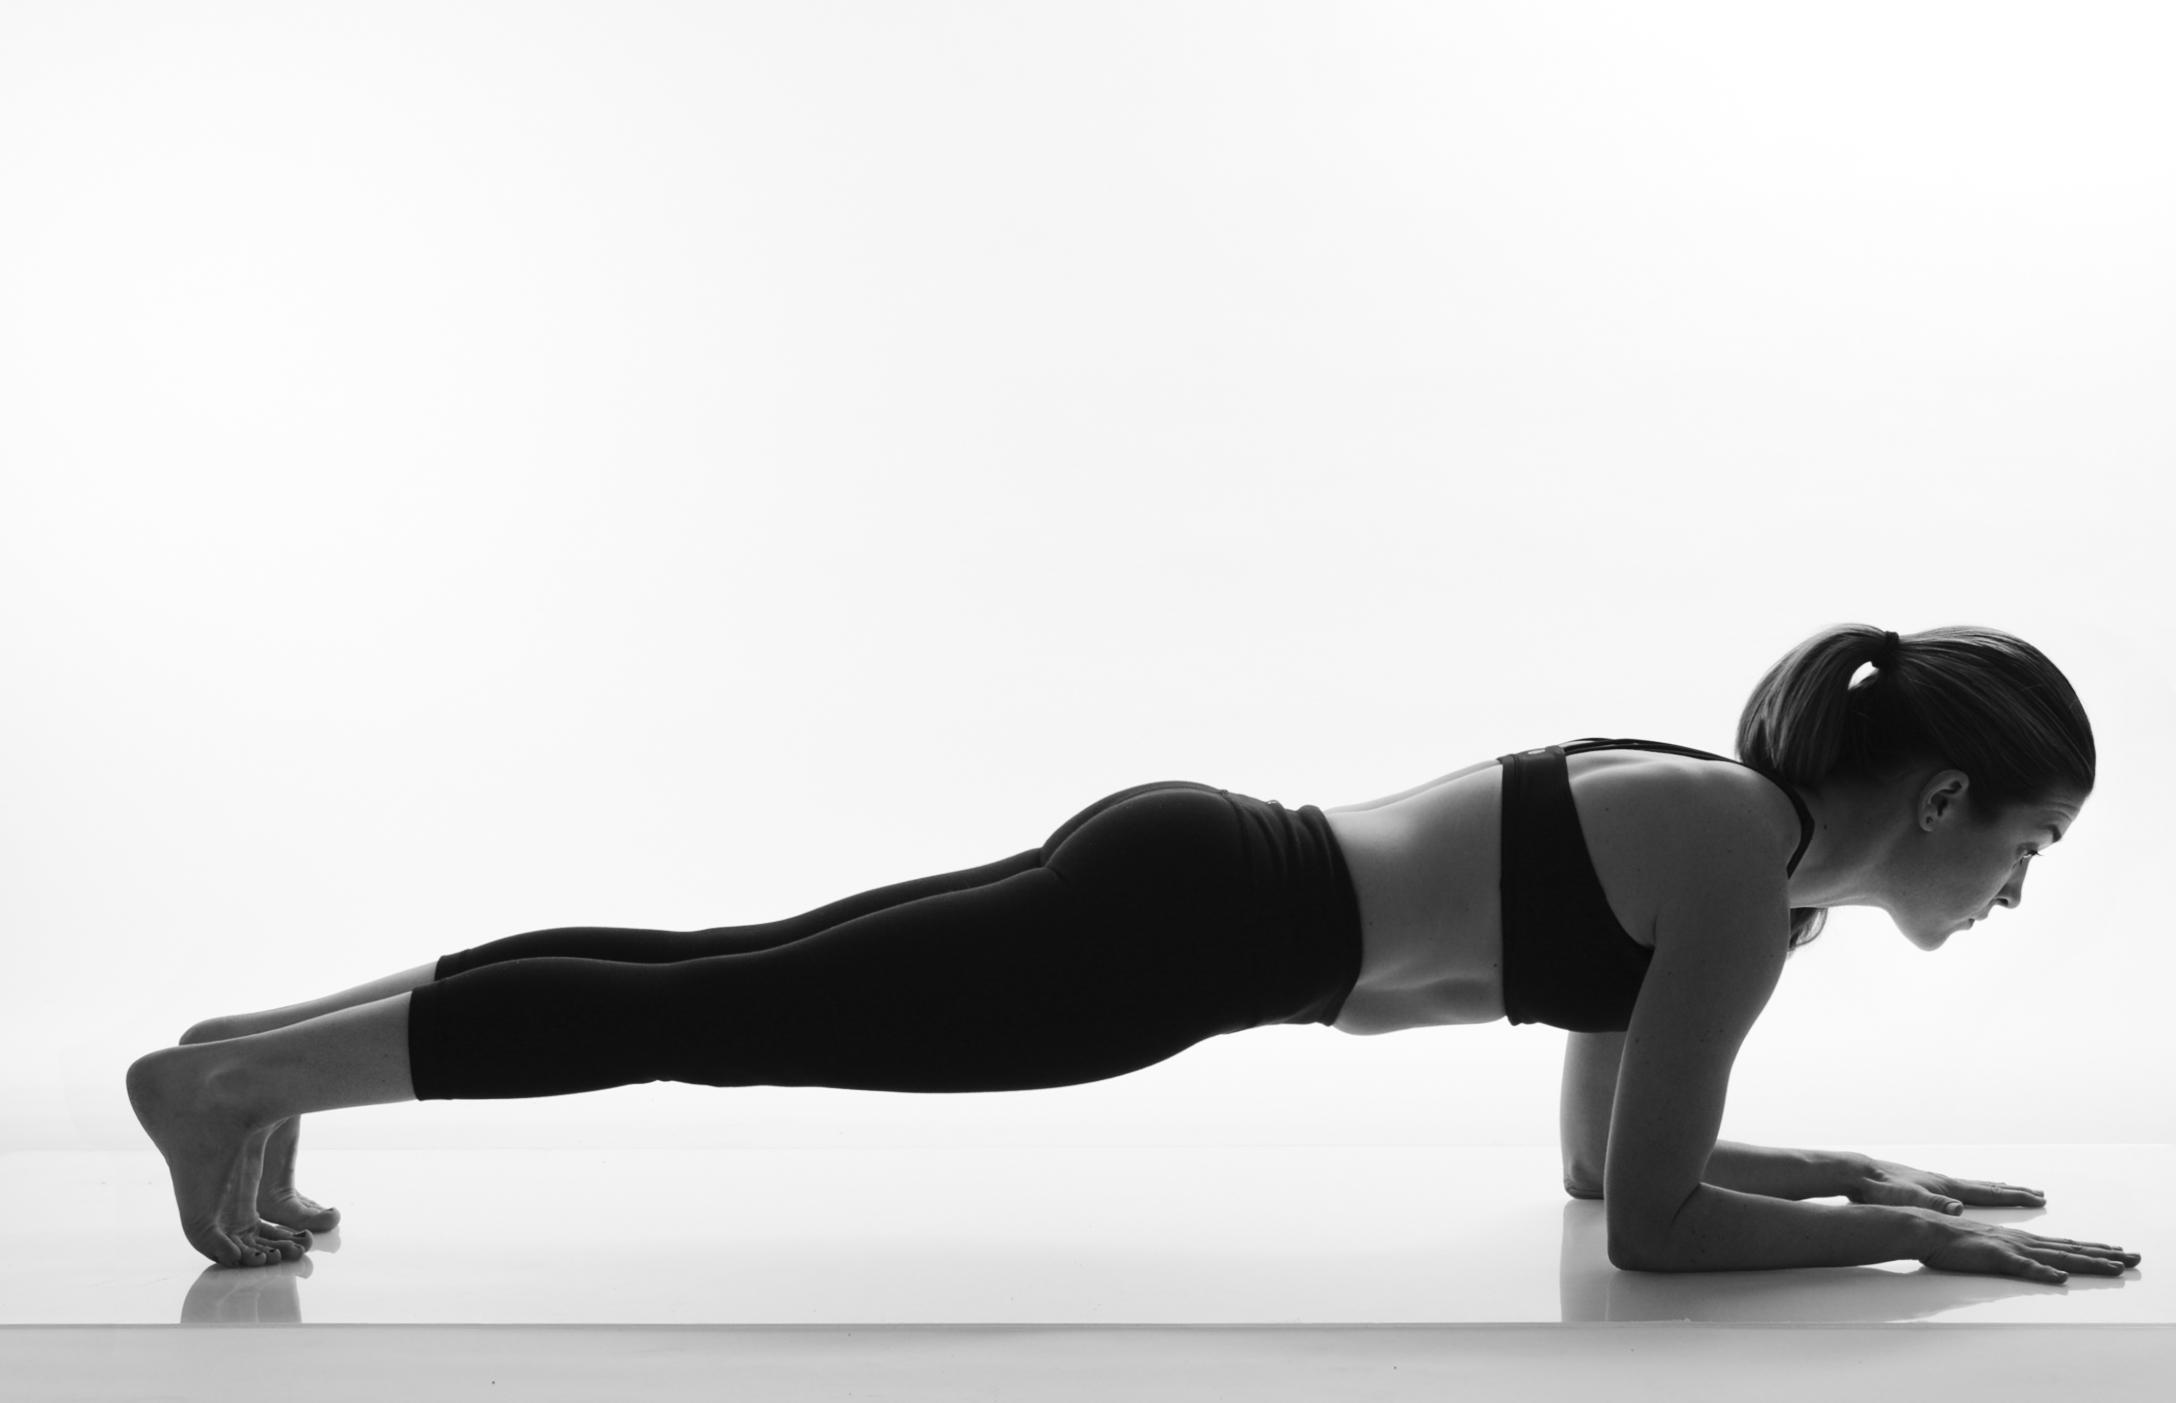 dolphin plank 2014.jpg